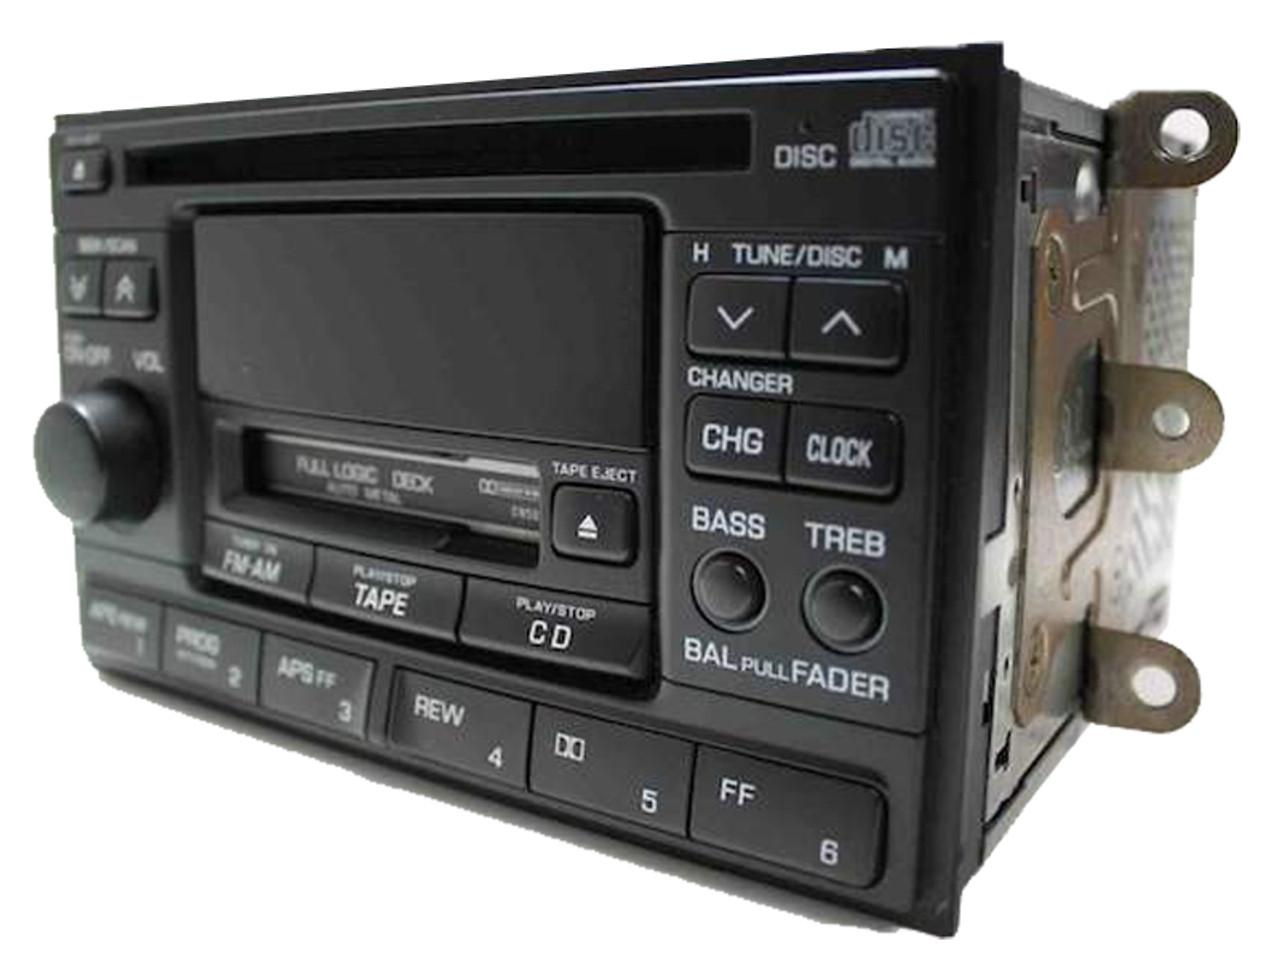 1995 1999 2001 Nissan 200sx Xterra Altima Radio Cd Playerrhcd4car: 2002 Nissan Xterra Radio Cd Player At Gmaili.net